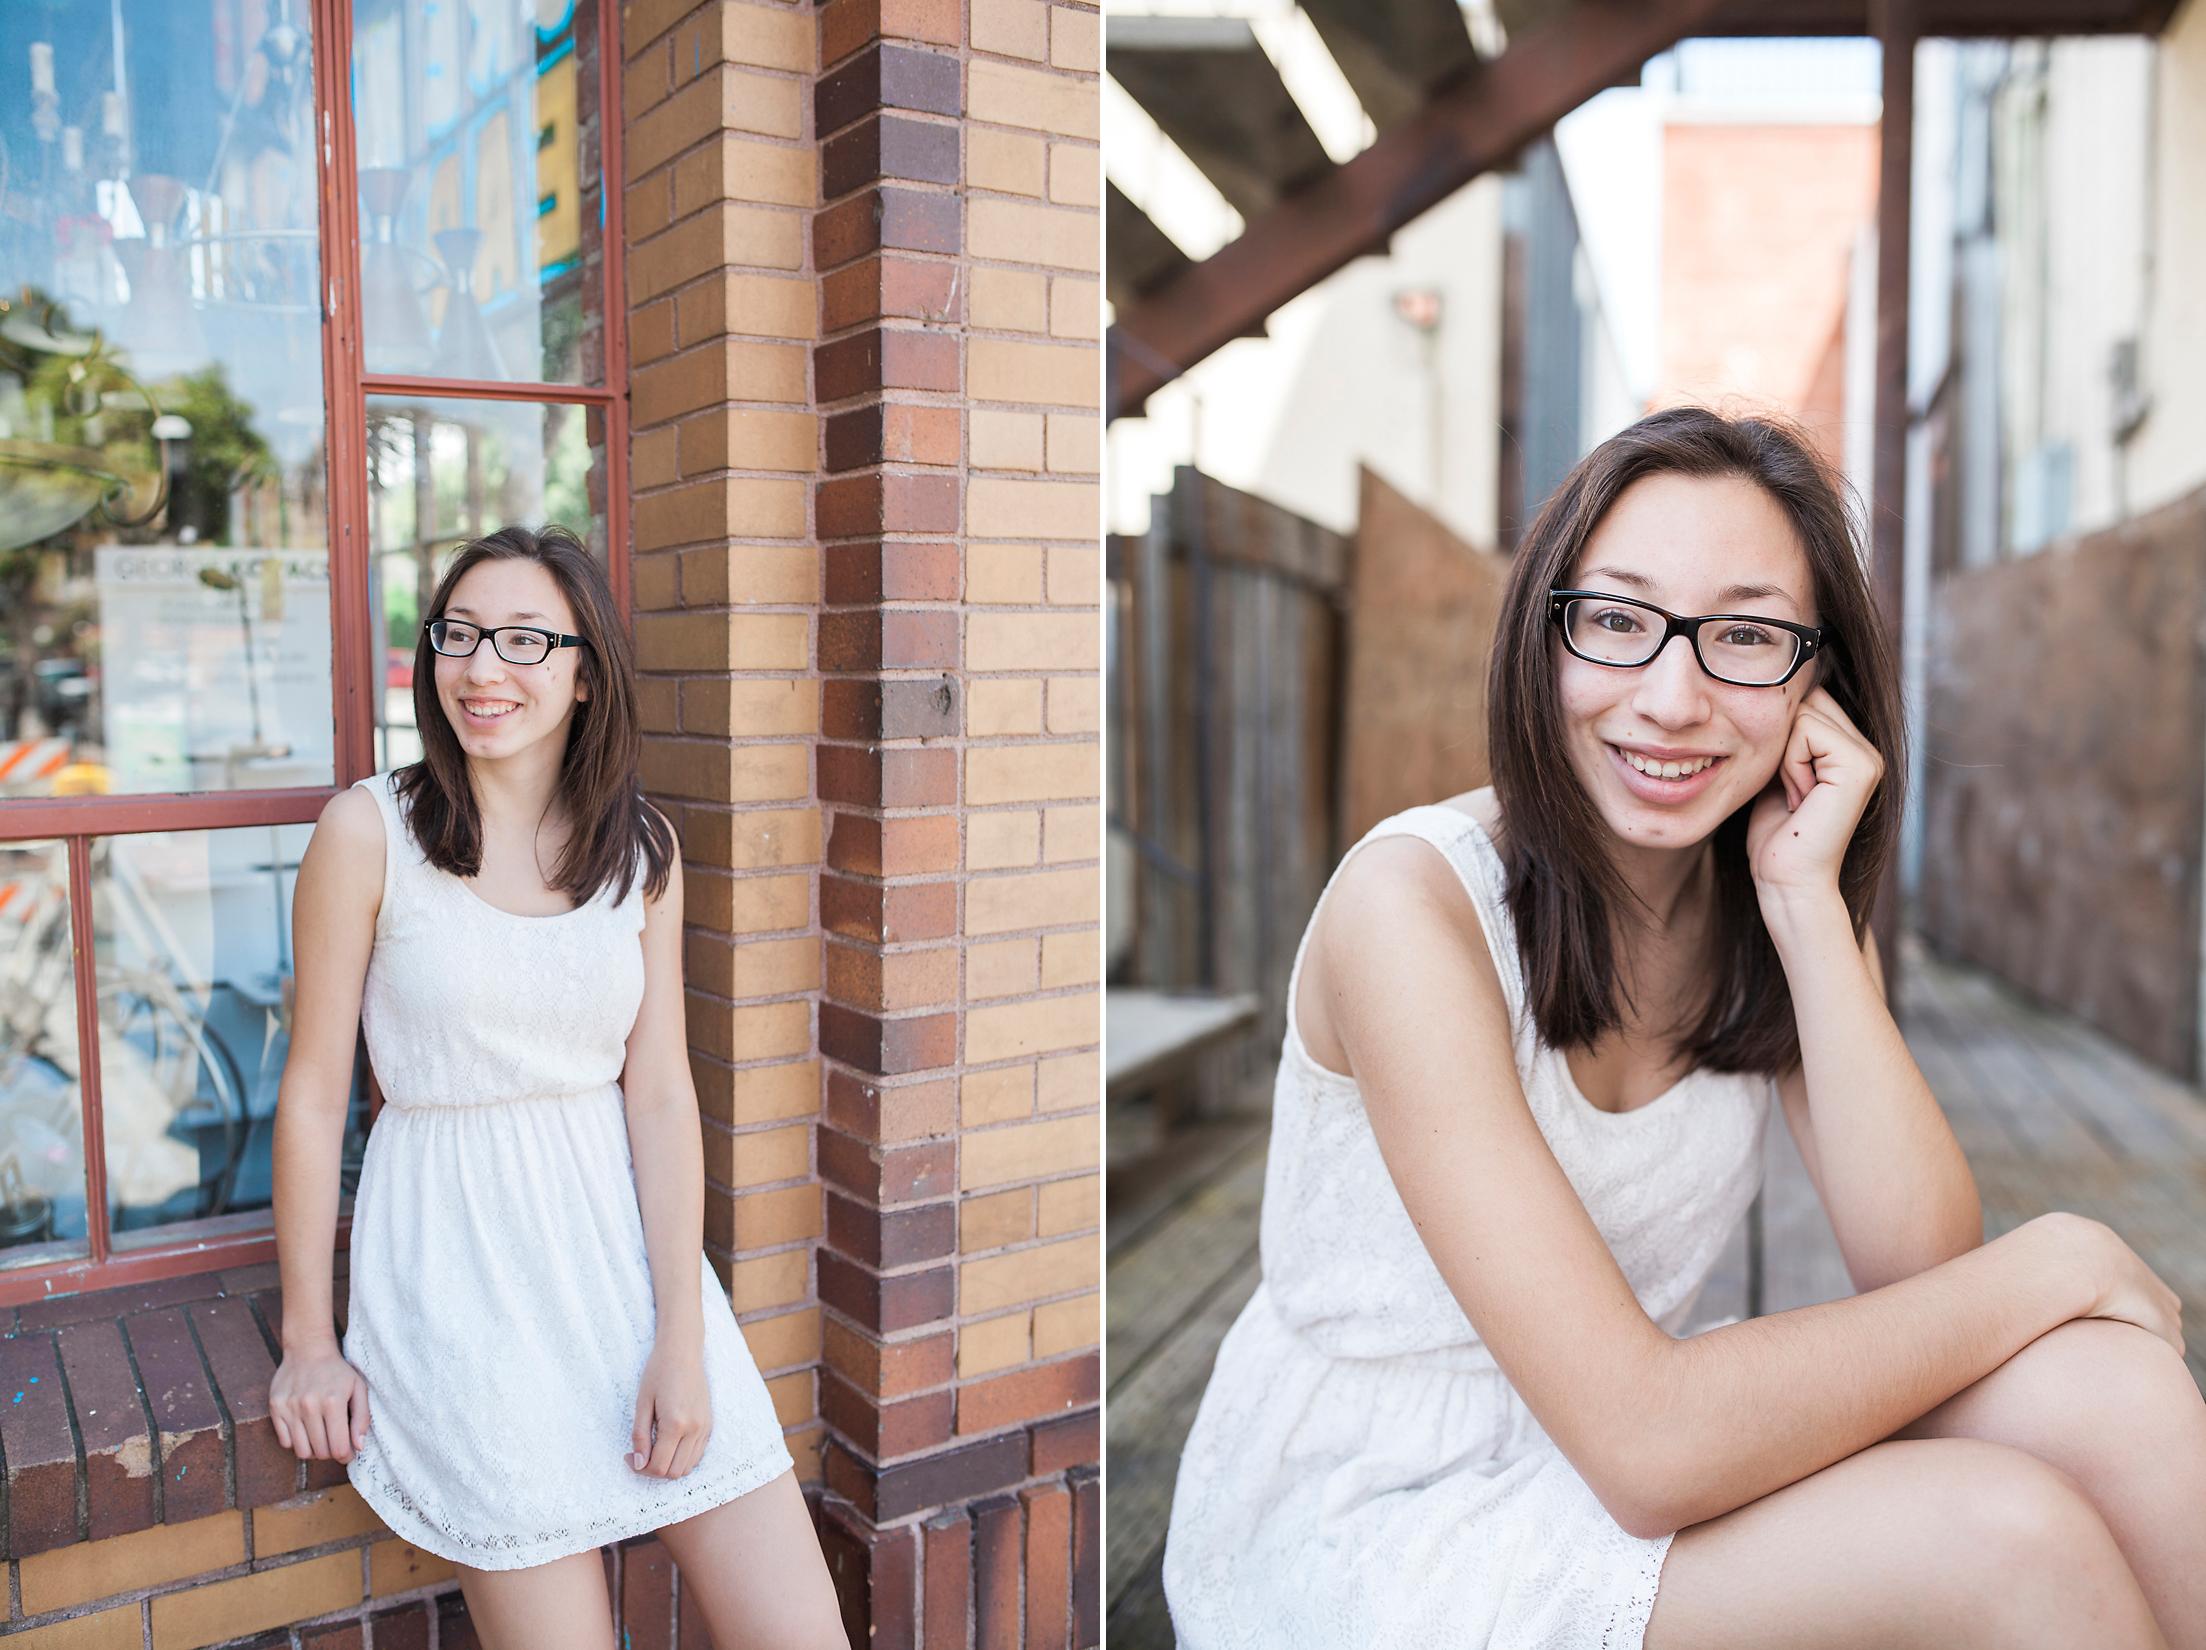 martinez_photographer_bay_area_senior_portraits_33.jpg